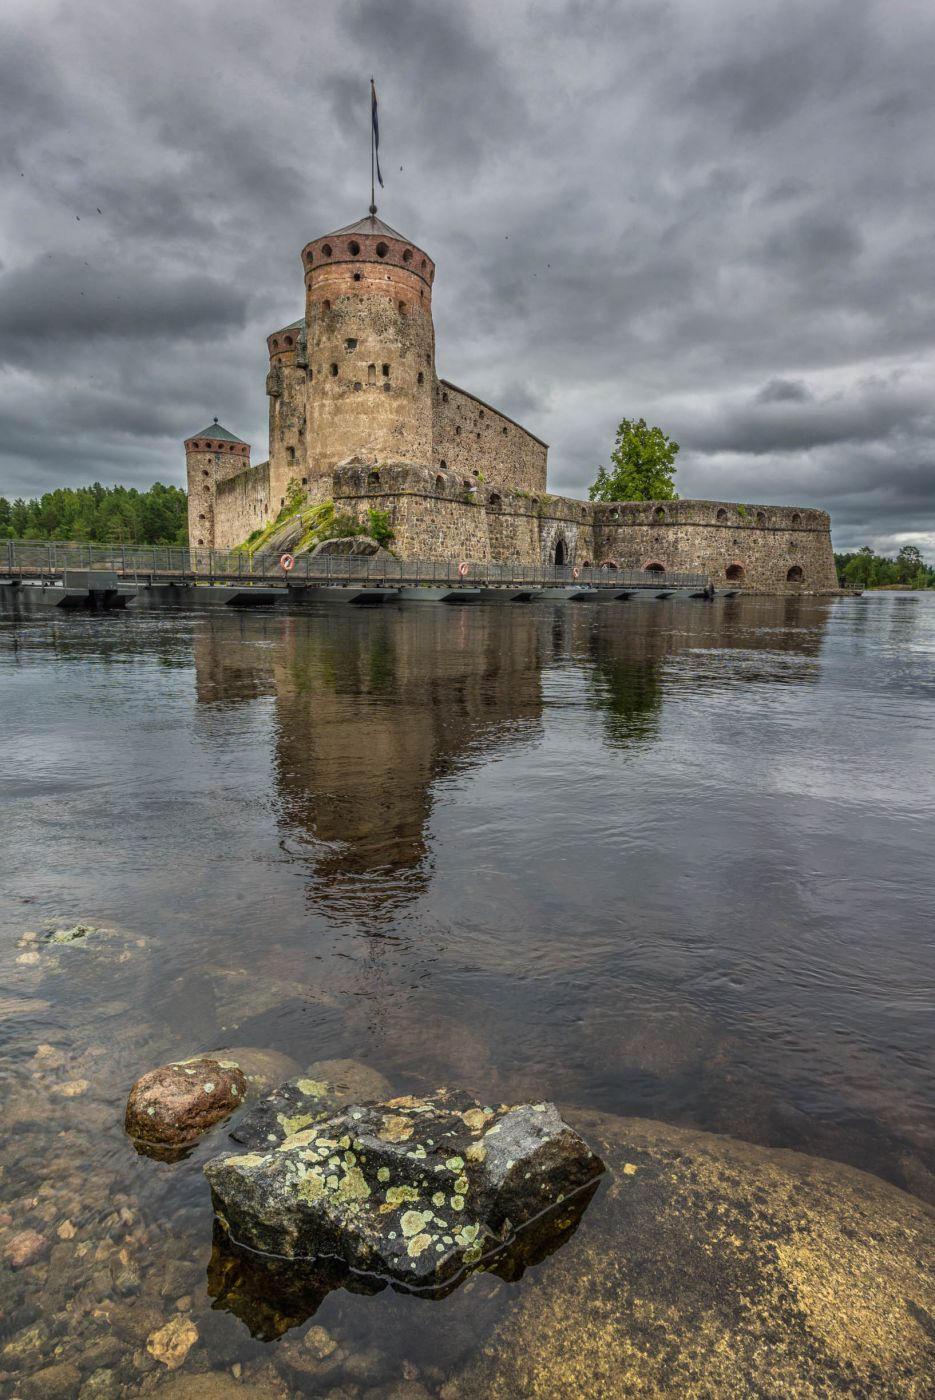 Olavinlinna medieval castle, Finland